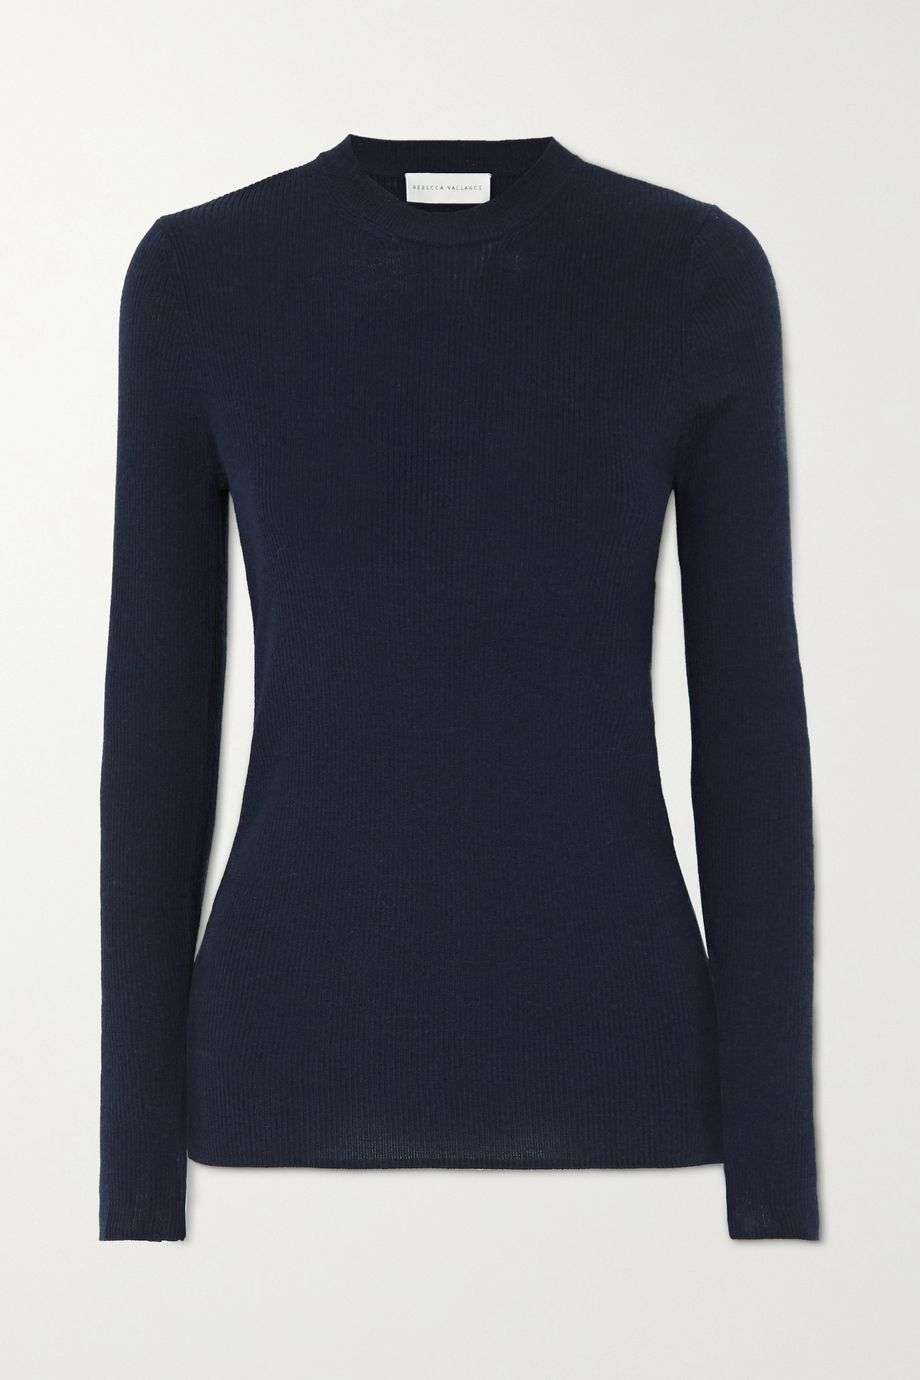 Rebecca Vallance Hinterland ribbed merino wool and silk-blend sweater